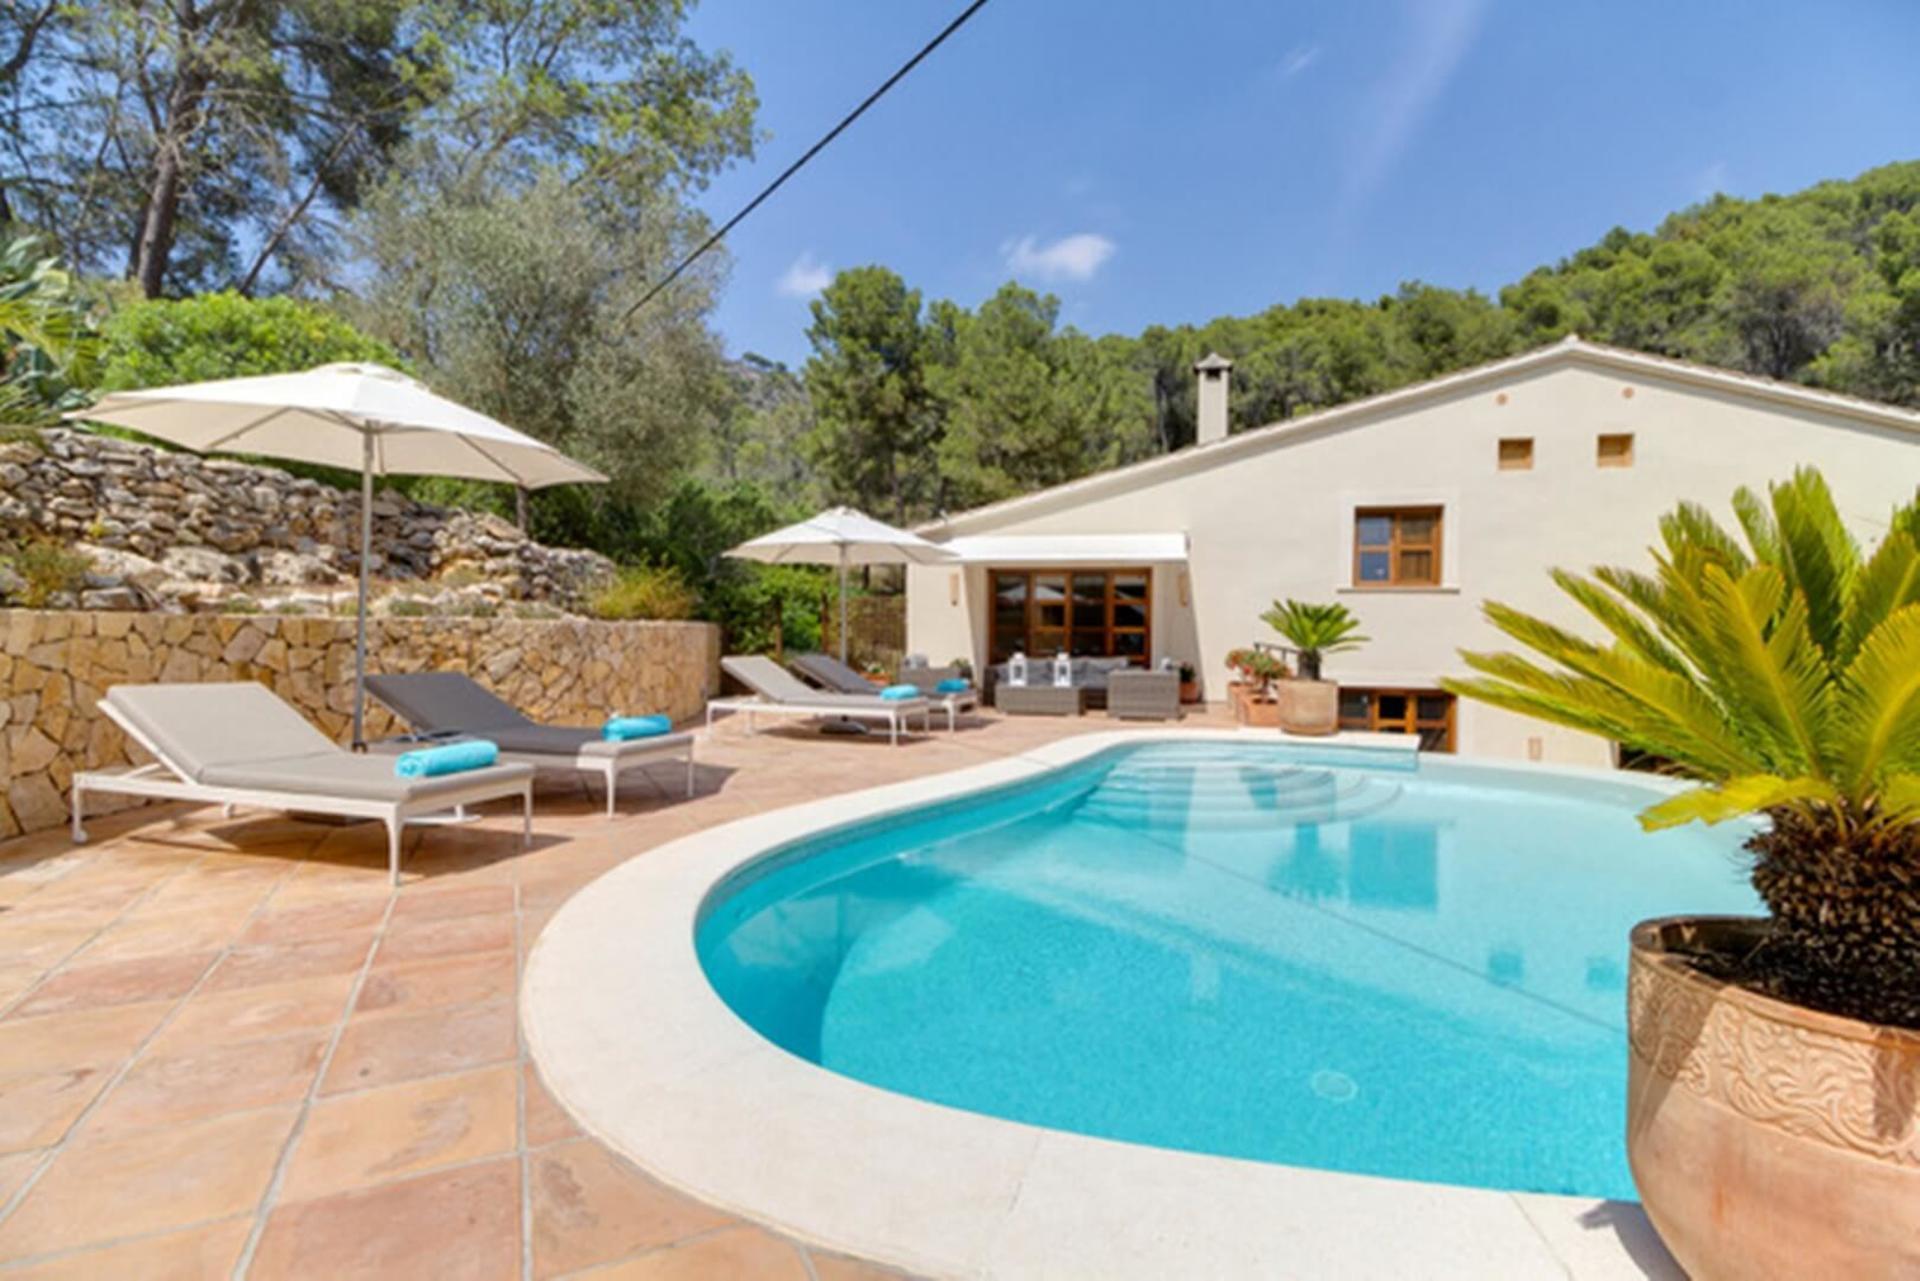 Luxury Mallorca Holiday Villa with Private Pool and Garden, Villa Cami